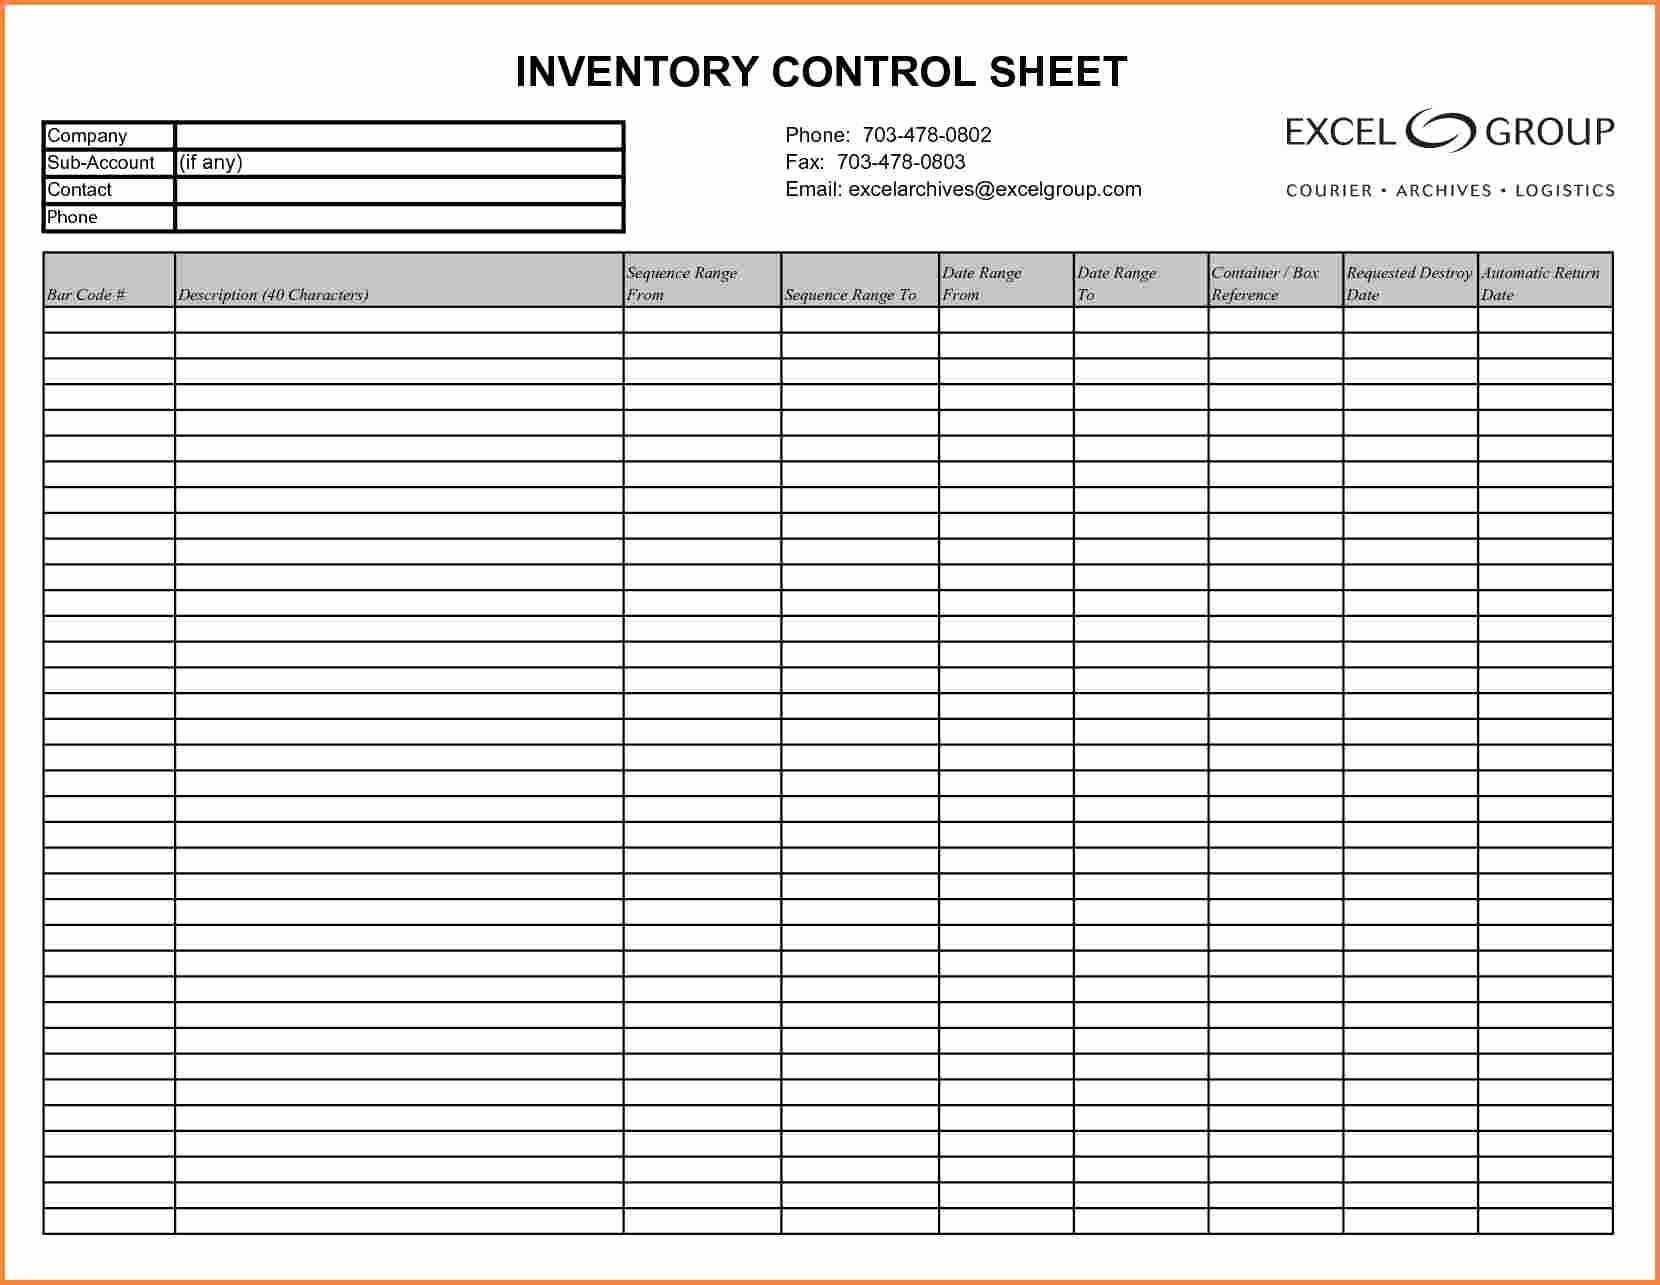 Football Equipment Inventory Spreadsheet Regarding Football Equipment Inventory Spreadsheet  Twables.site